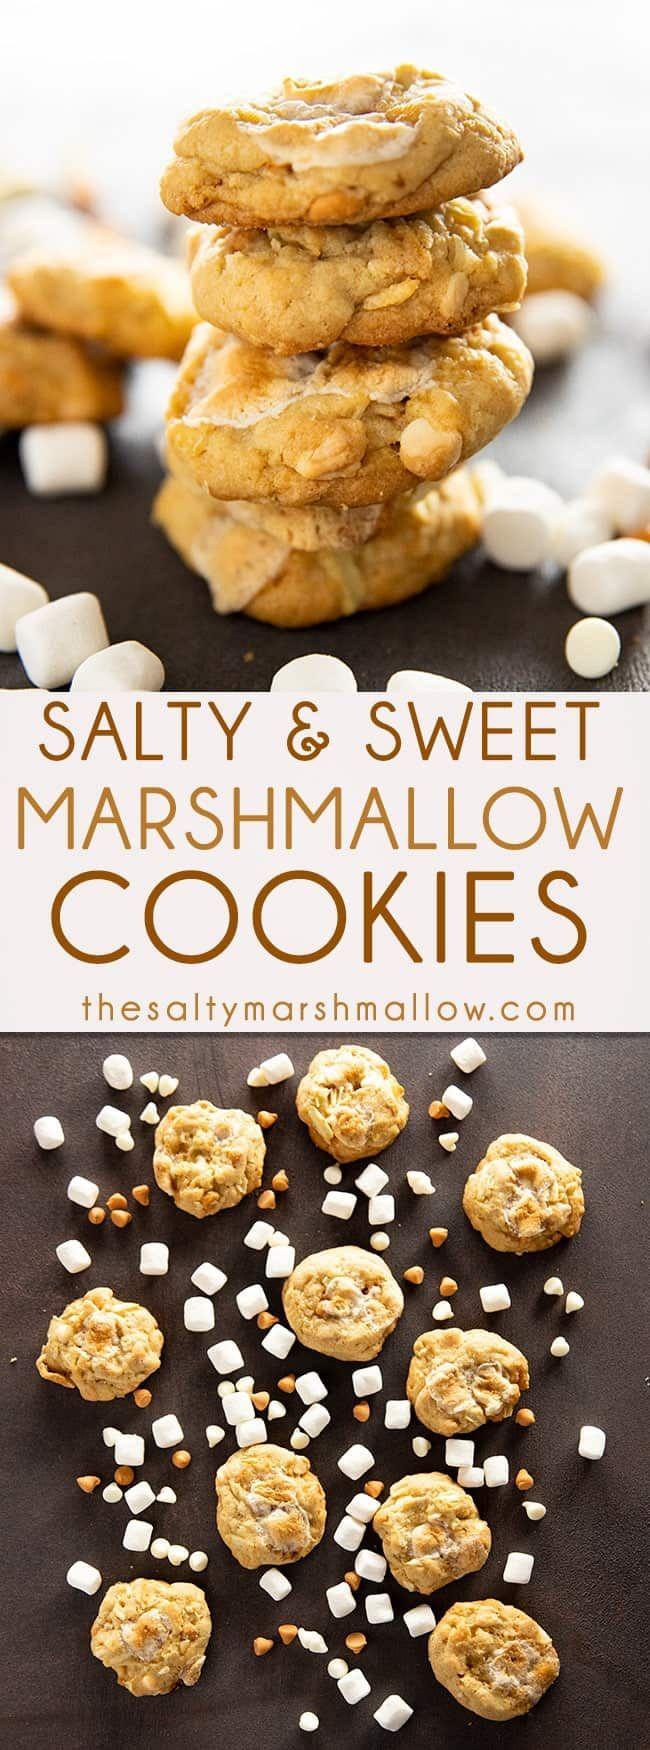 Salty Marshmallow Cookies (Potato Chip Cookies)